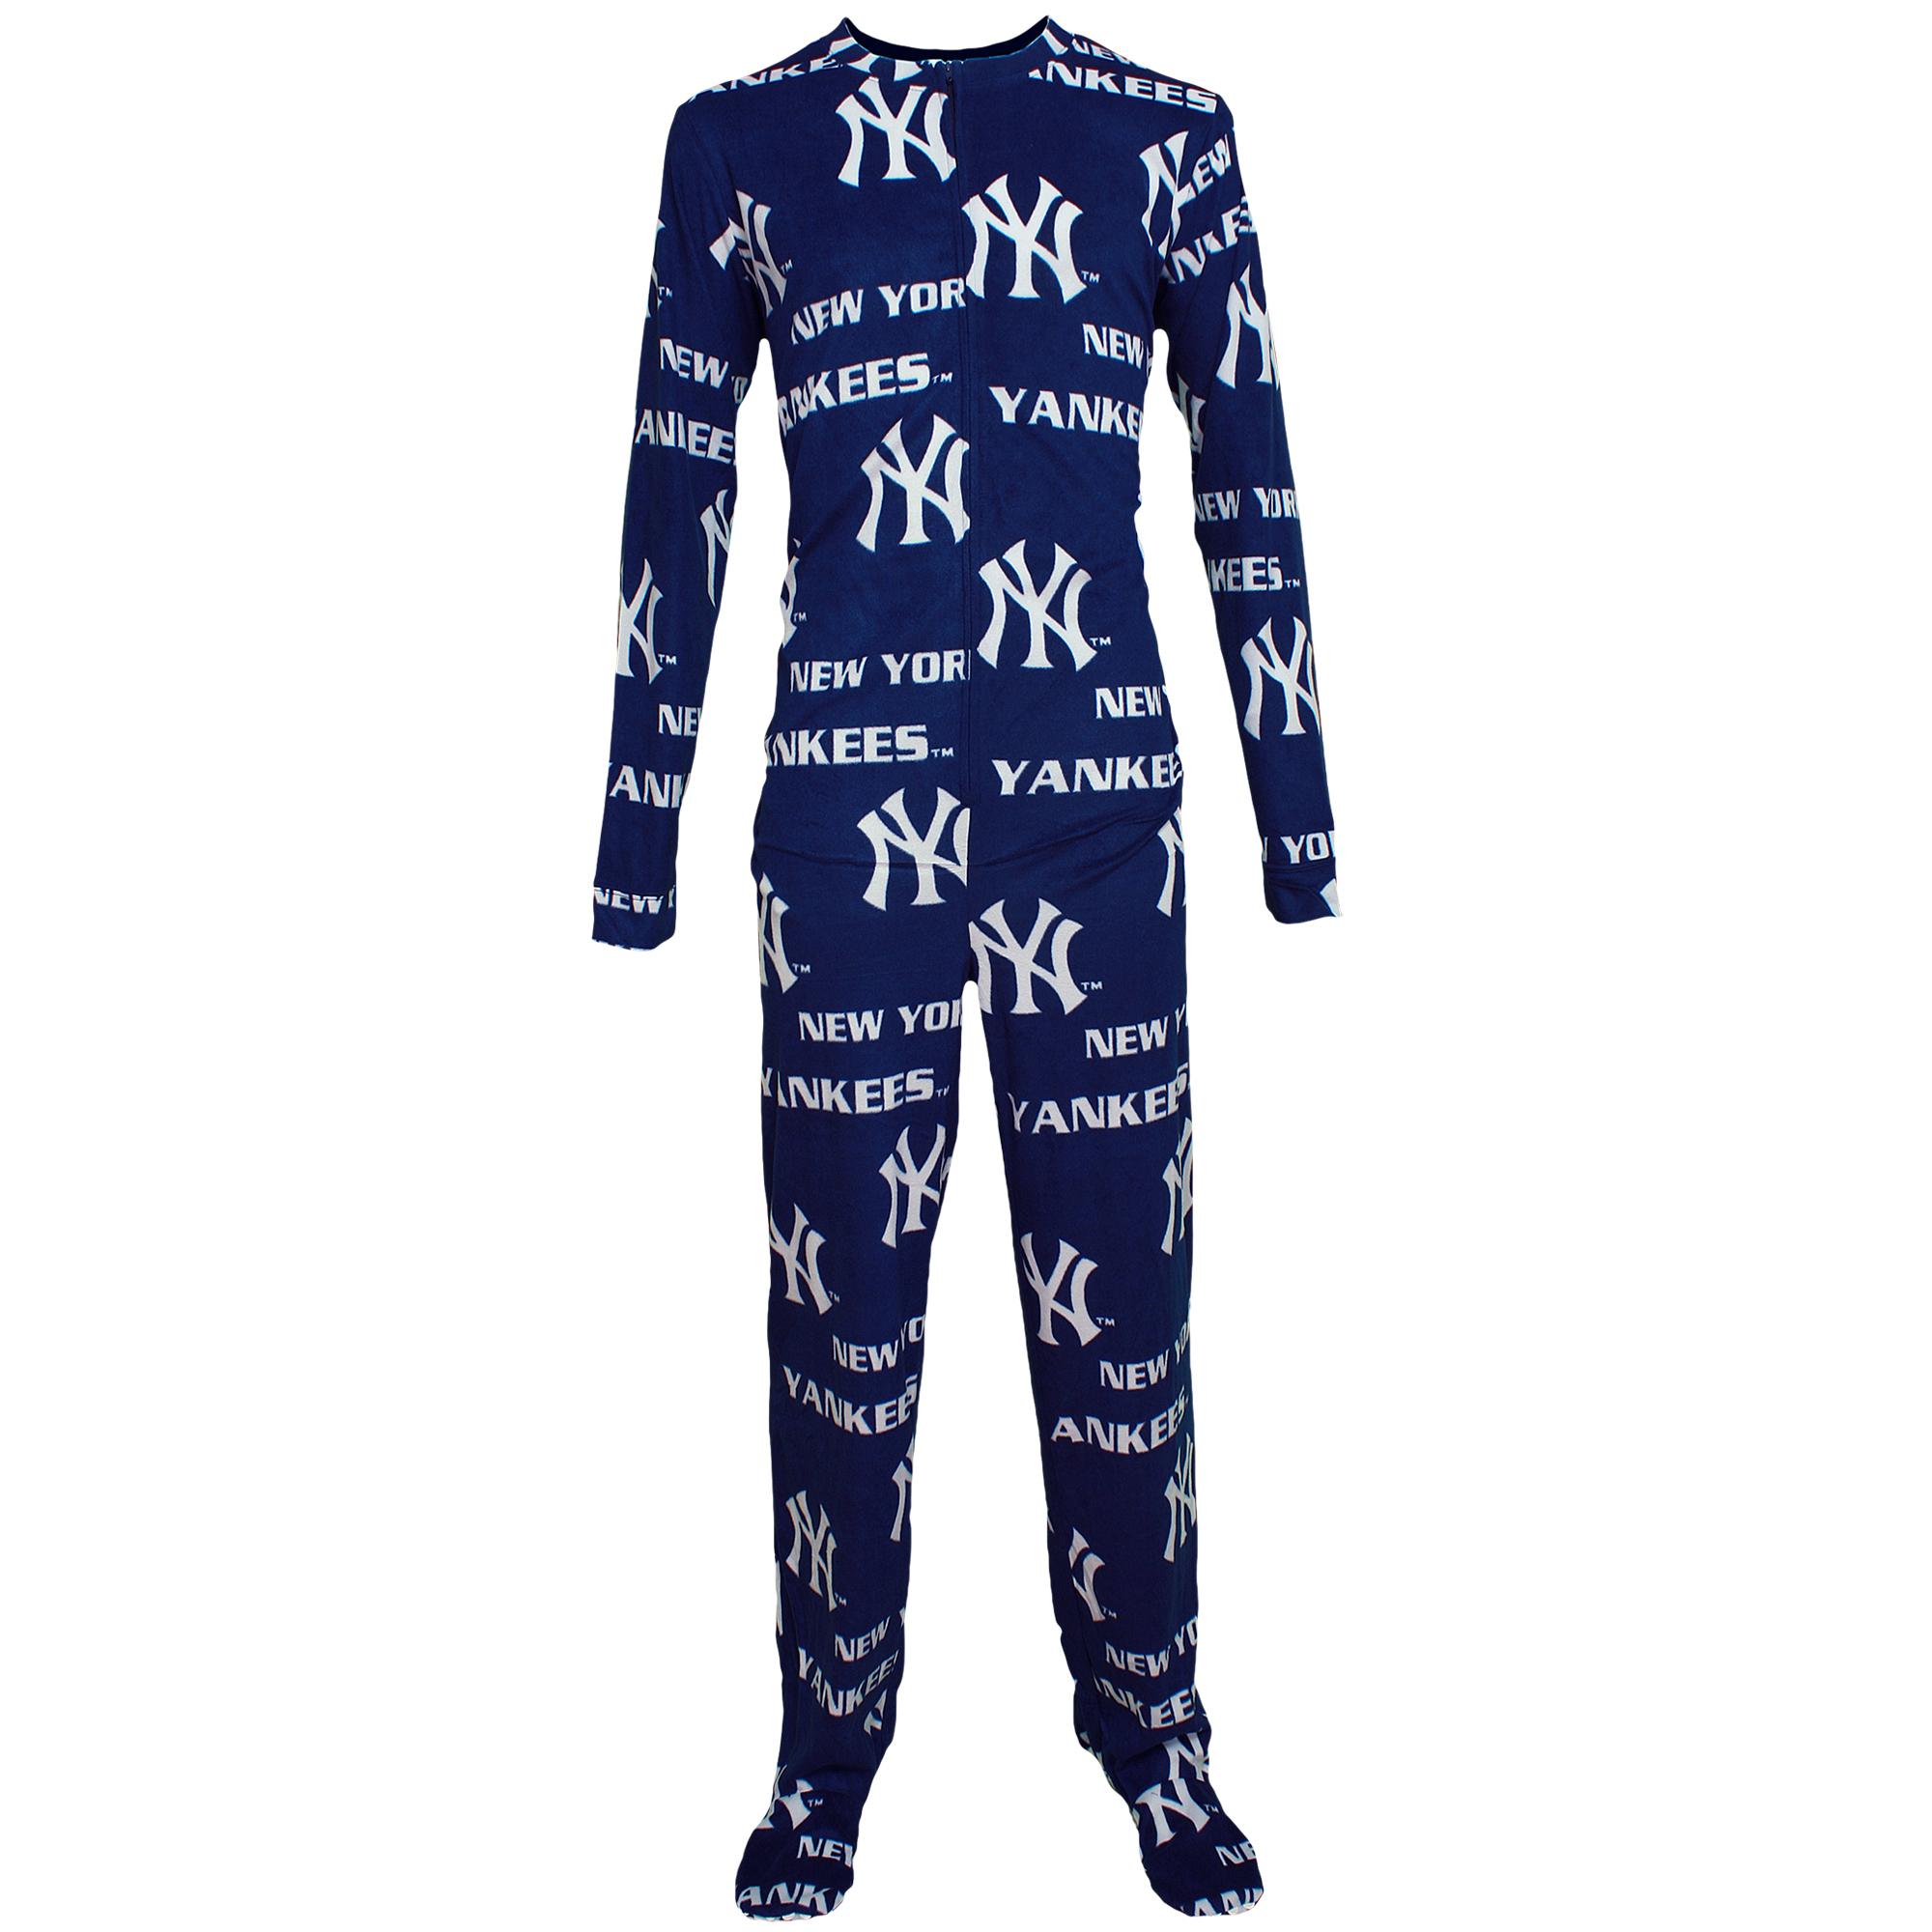 New York Yankees Concepts Sport Union Suit Pajamas - Navy